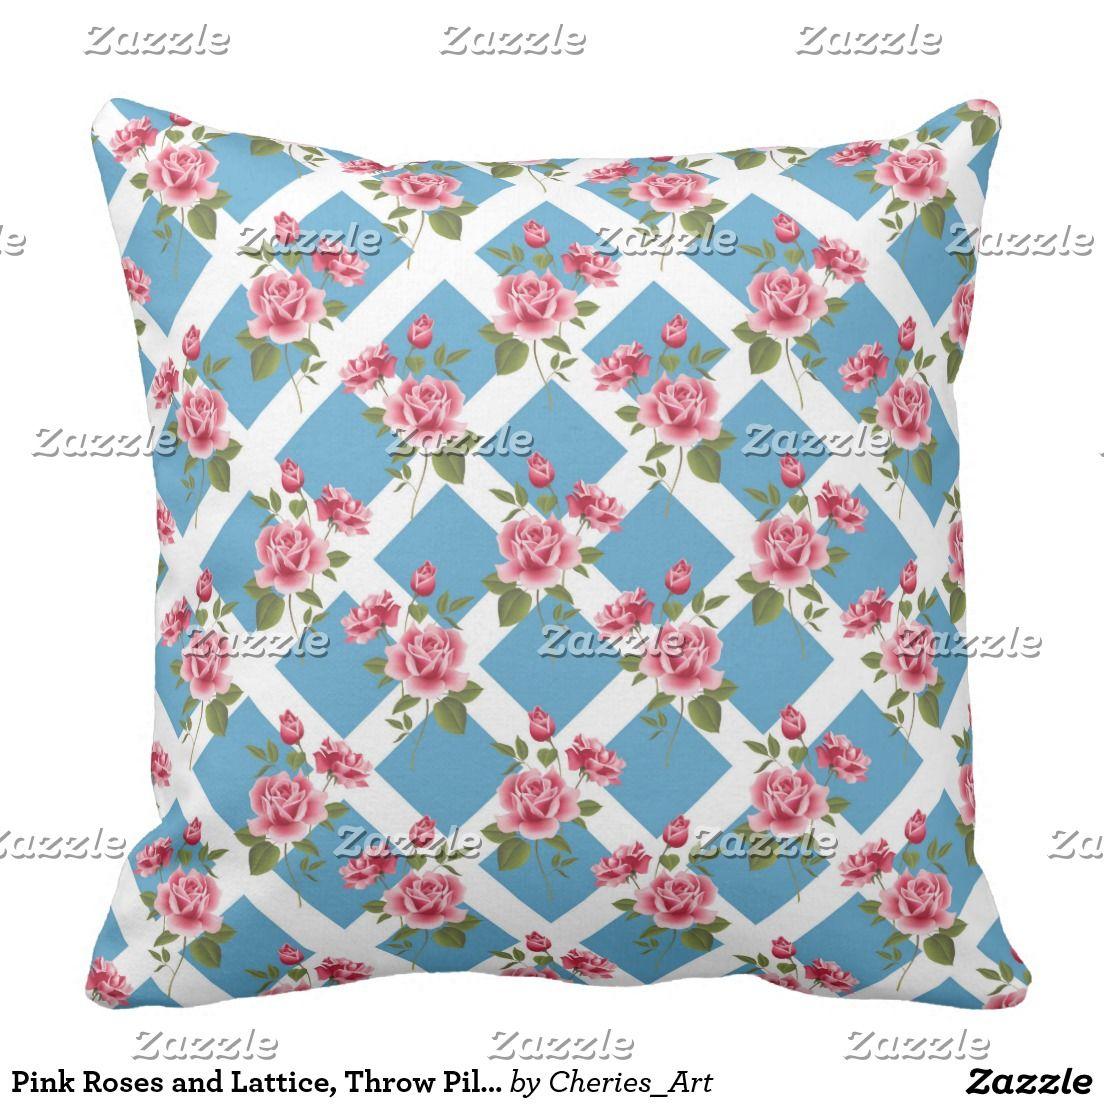 "Pink Roses and Lattice, Throw Pillow 20"" x 20"""